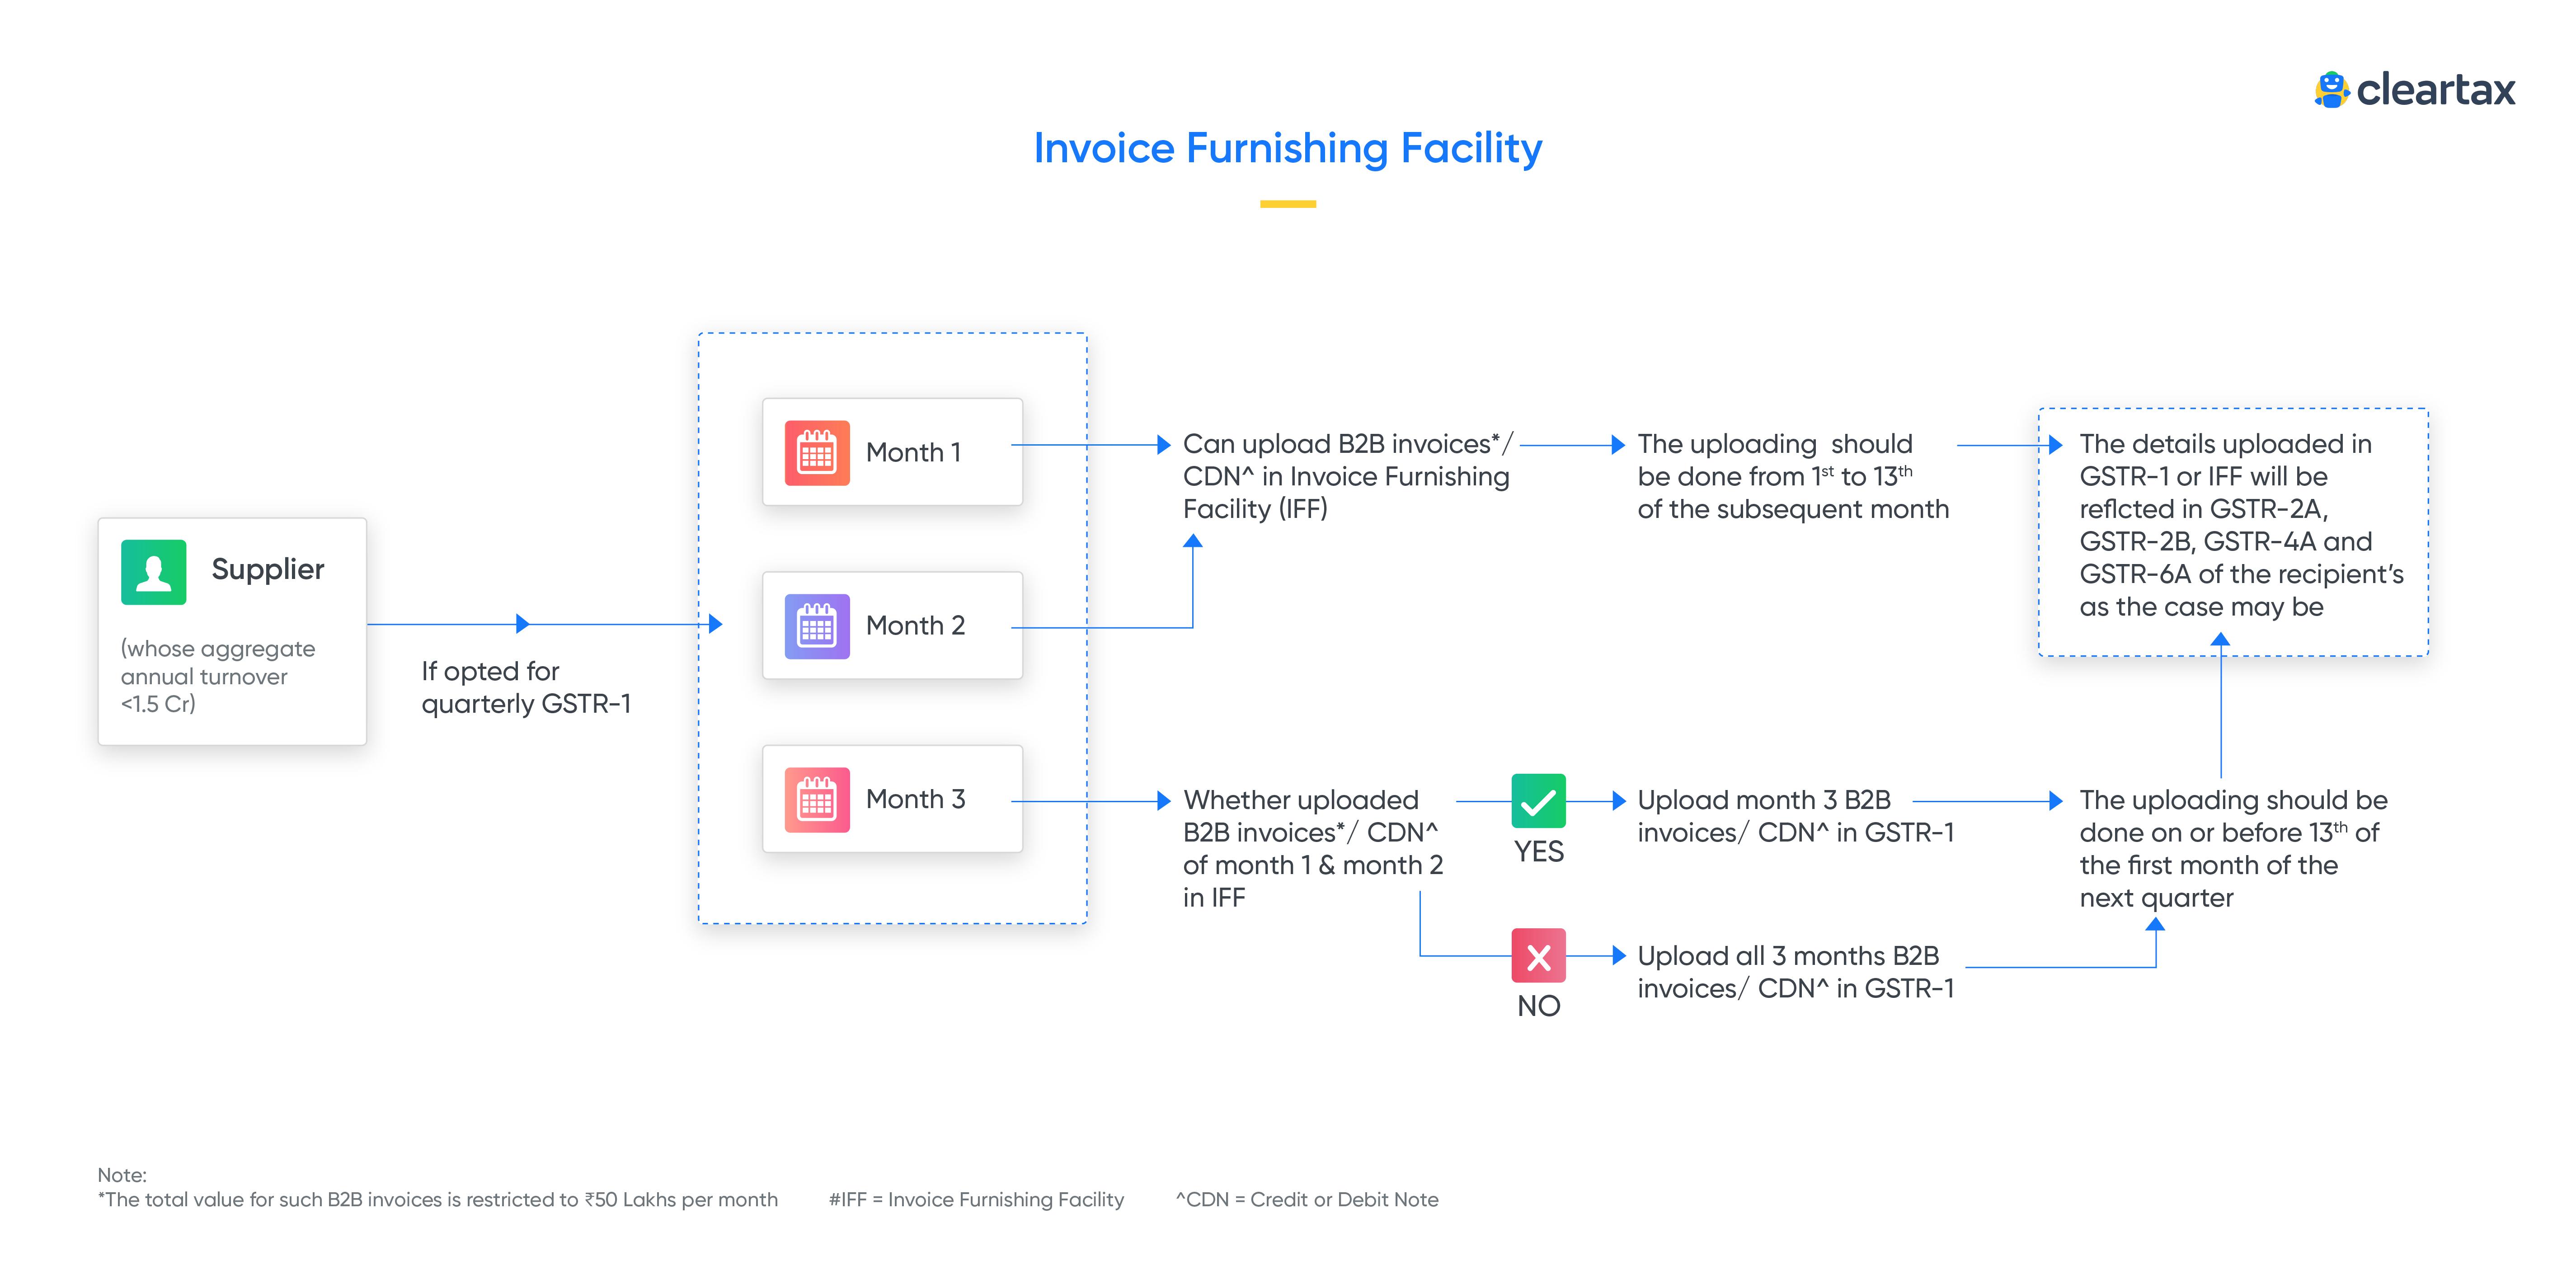 invoice-furnishing-facility(IFF)